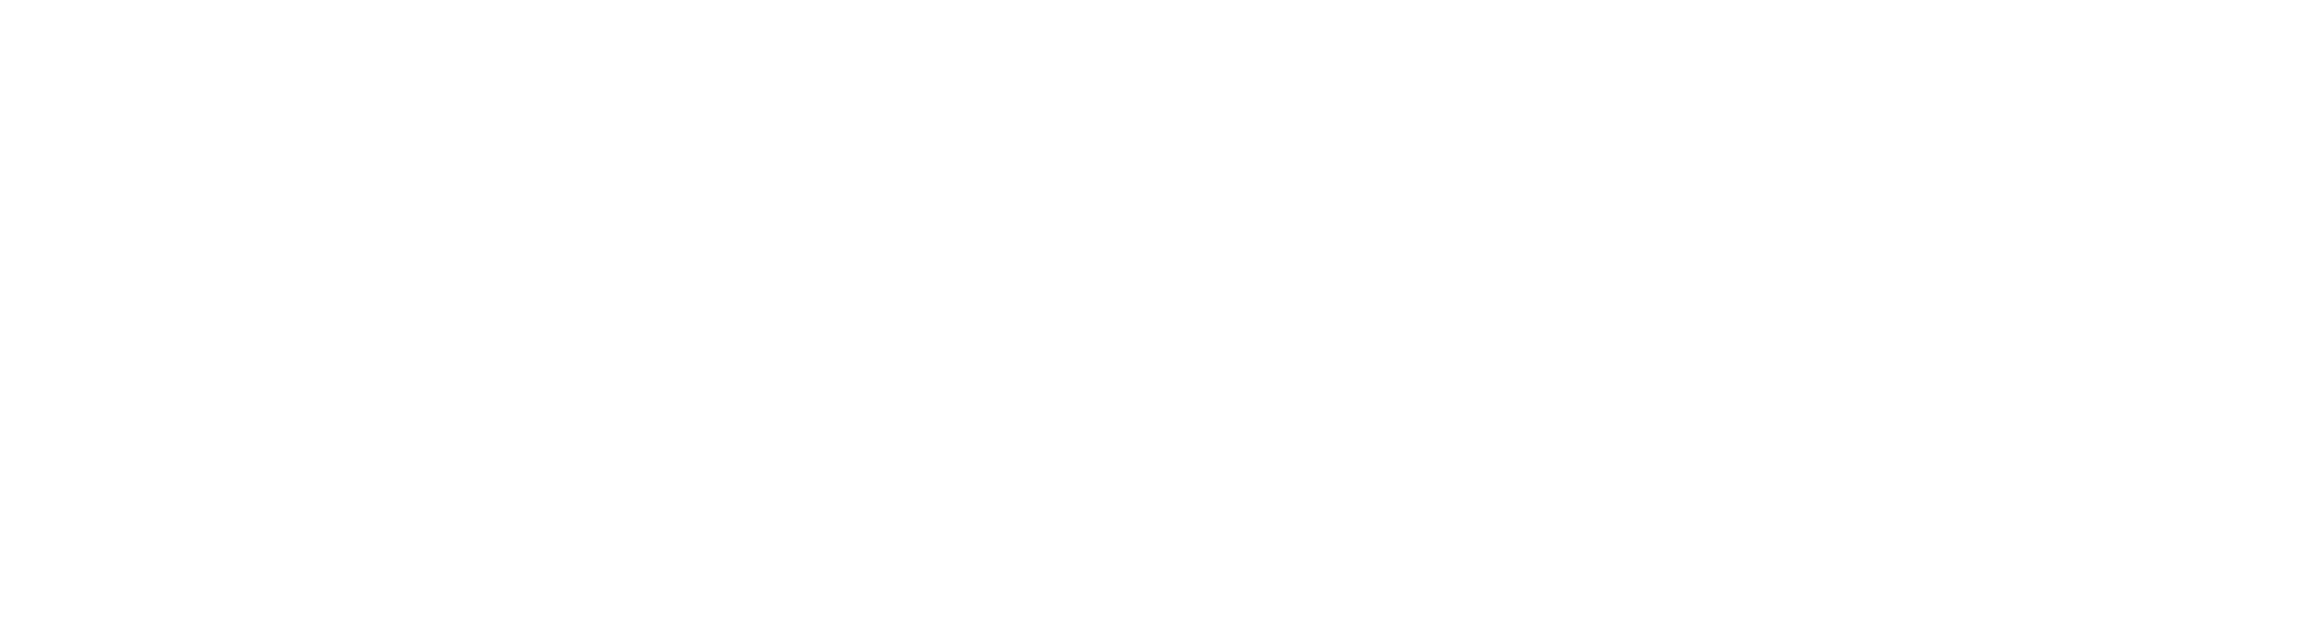 enigma logo 2105.